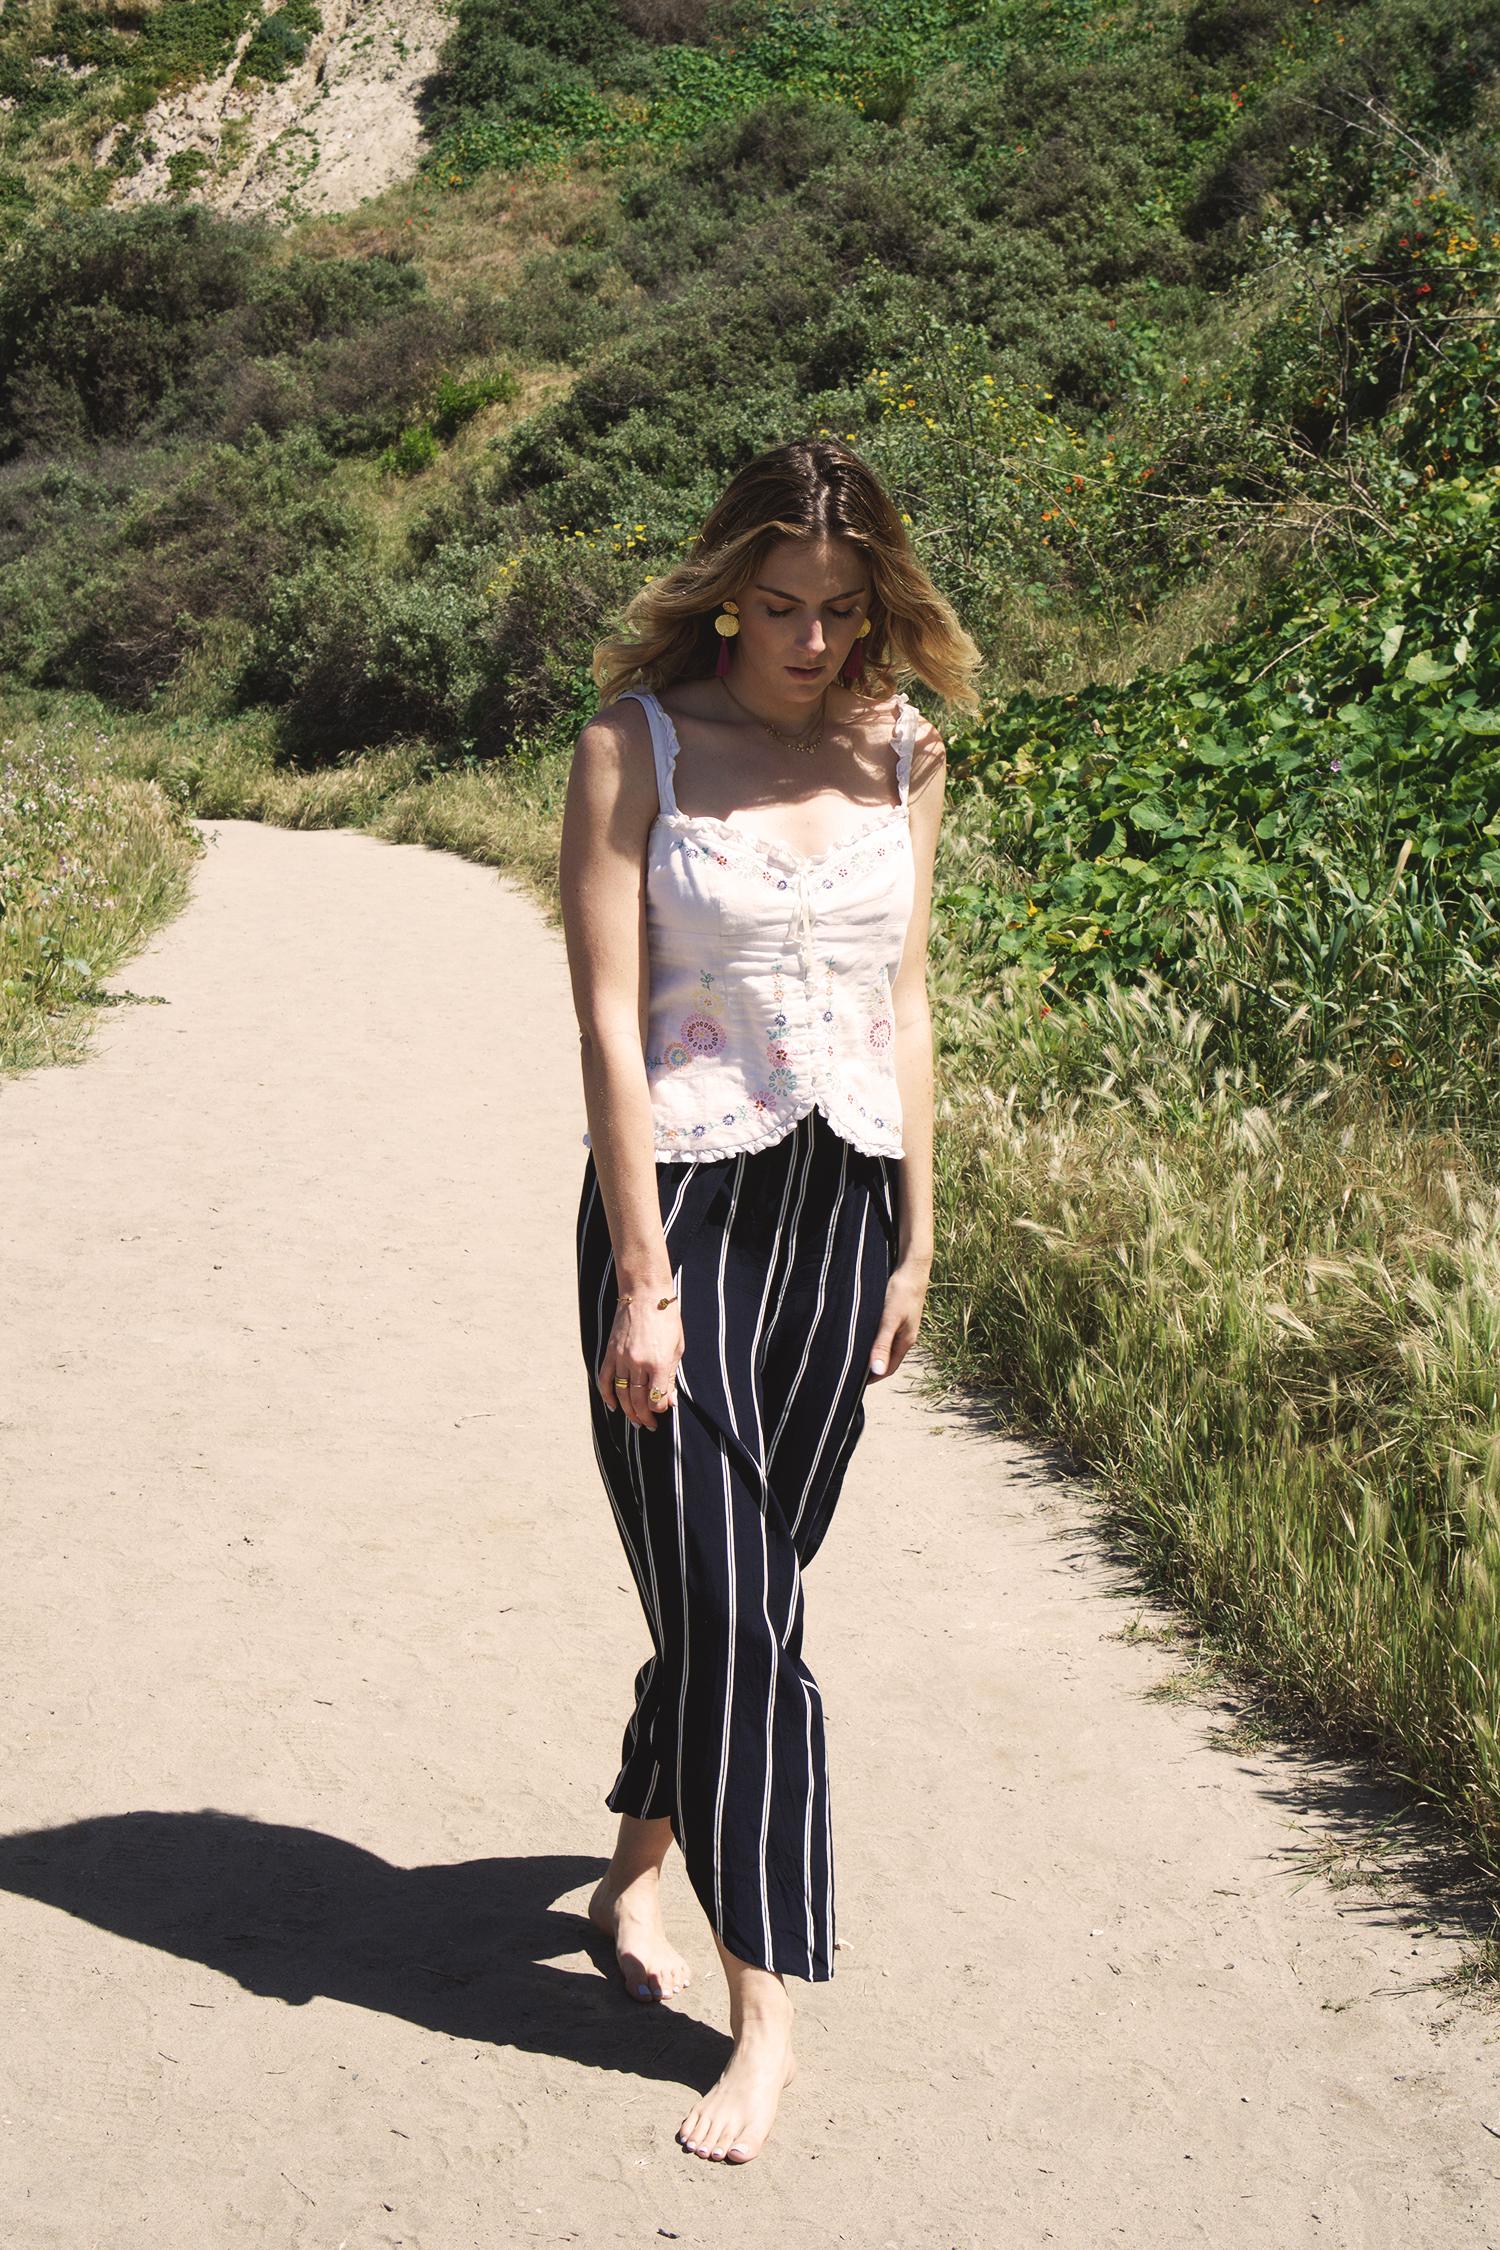 kimberly-rabbit-easy-breezy-summer-pants6.jpg